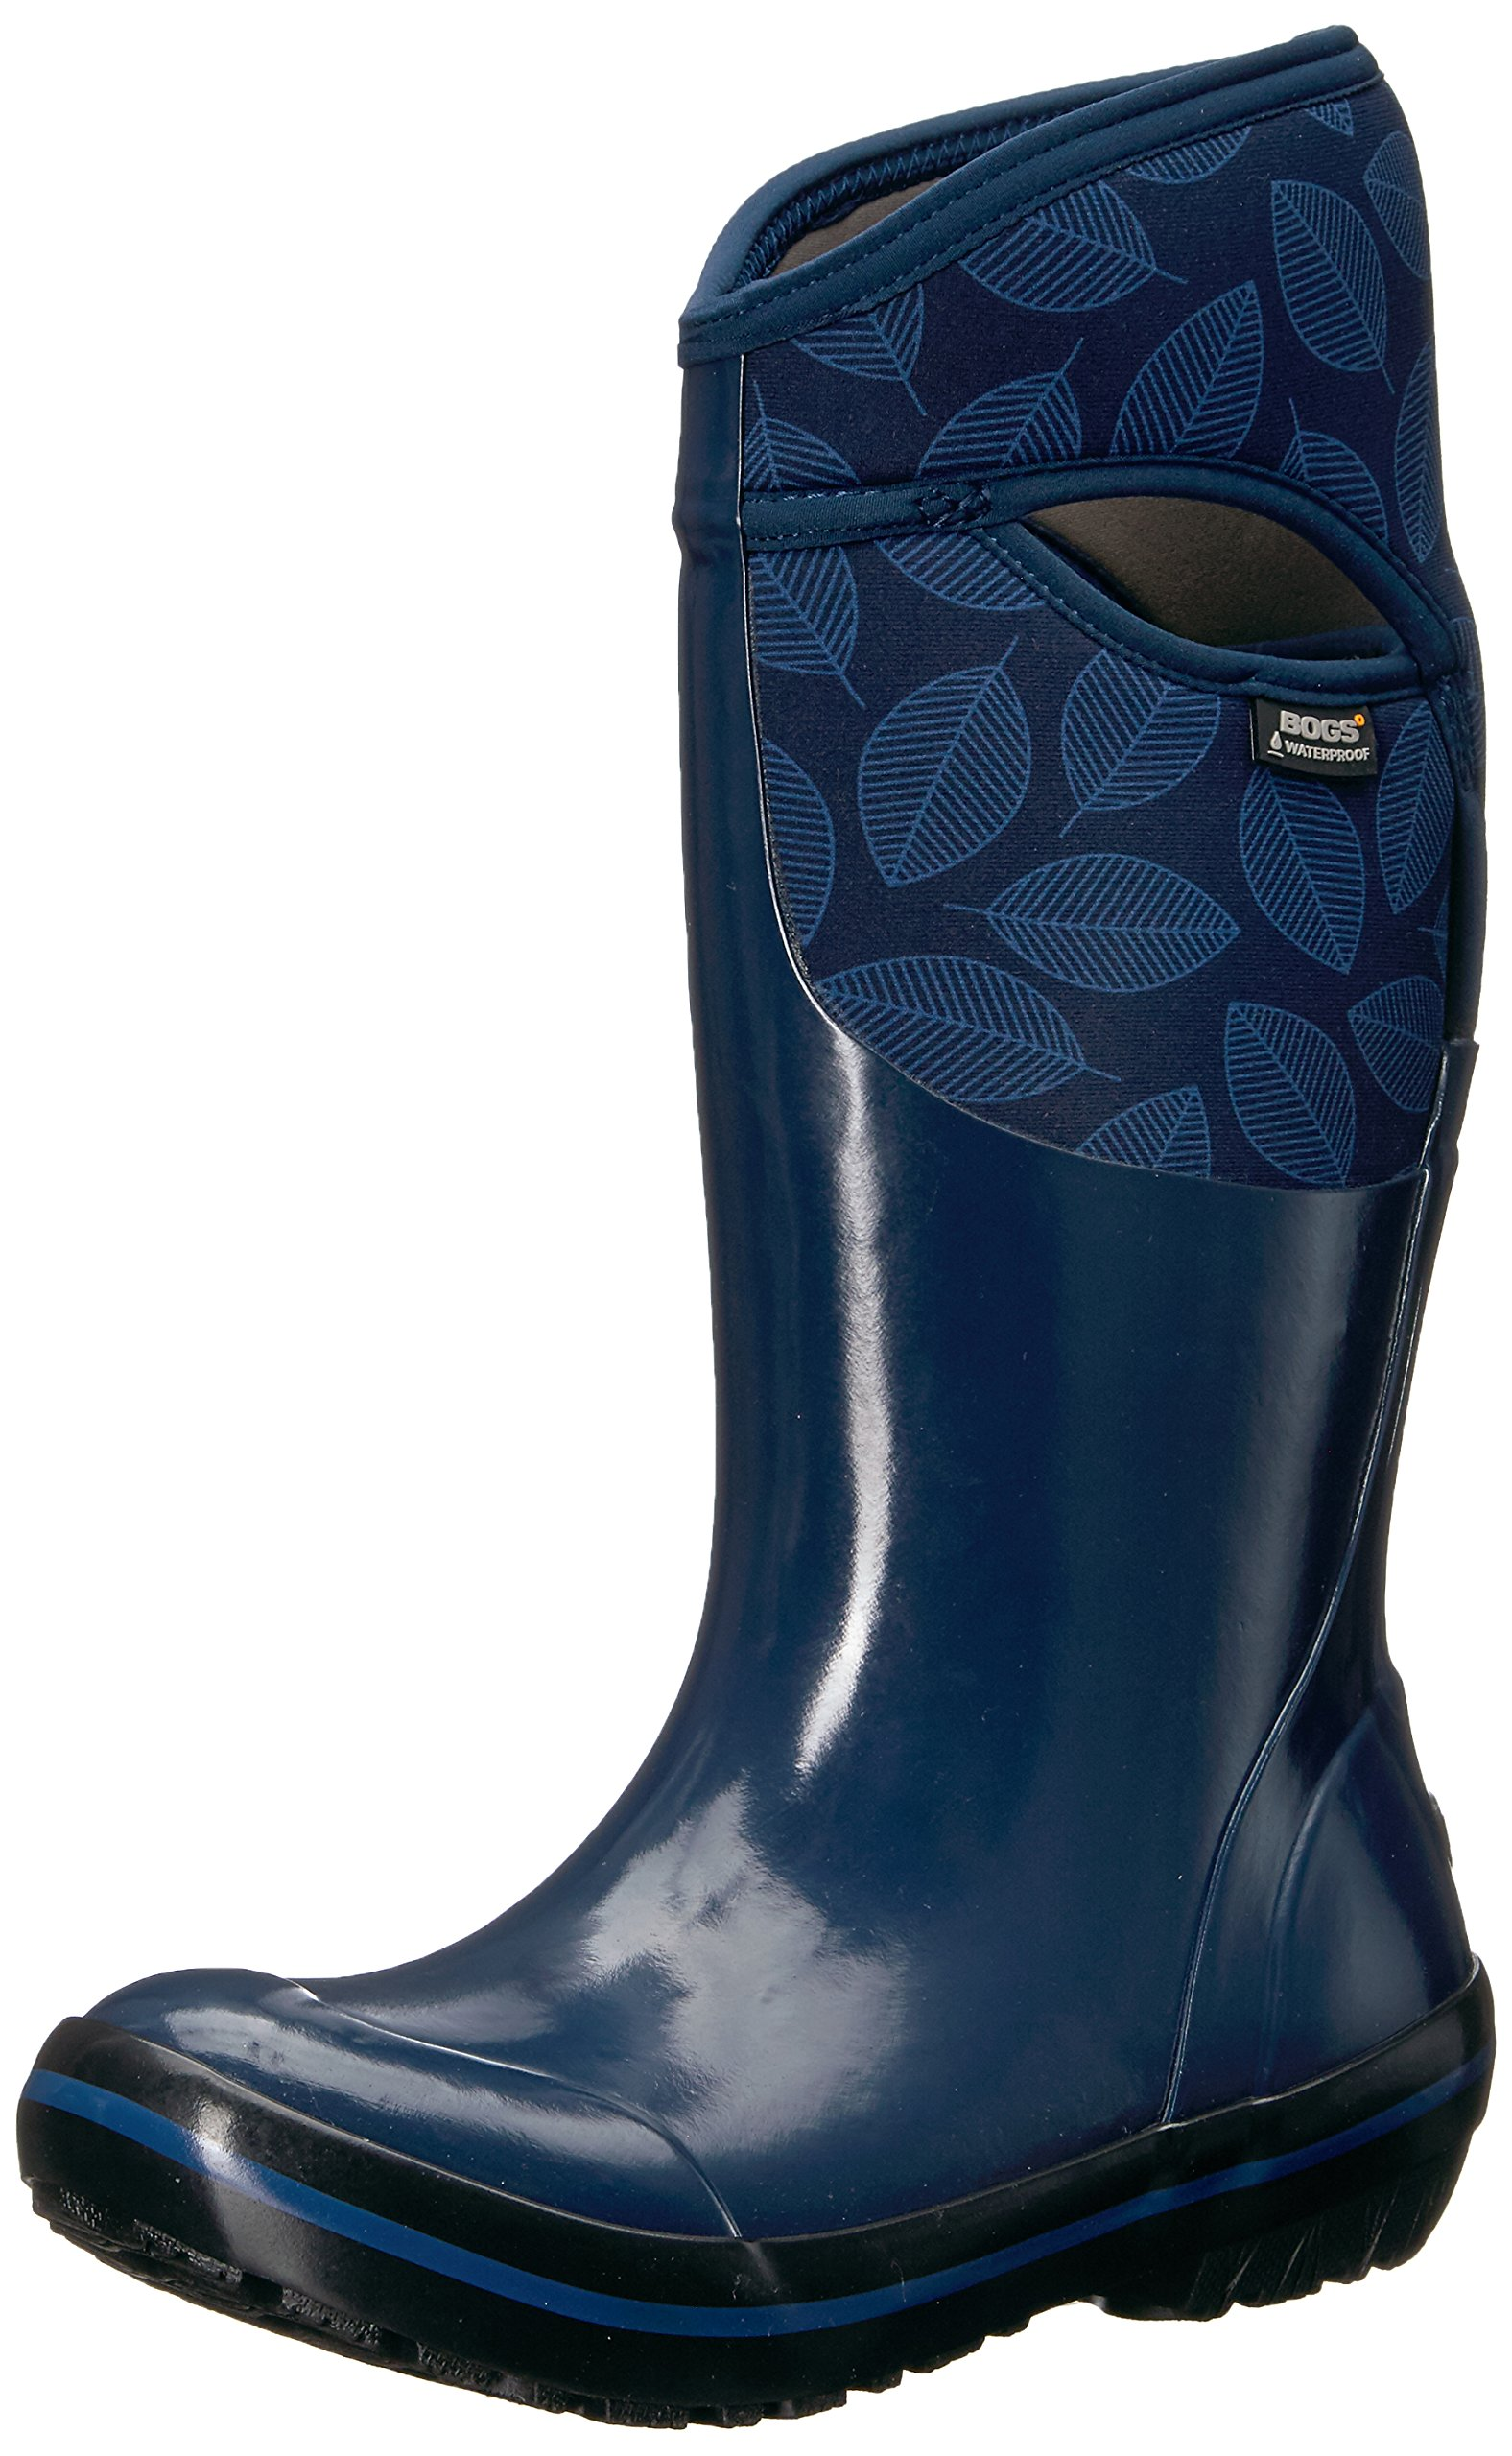 Bogs Women's Plimsoll Leafy Tall Snow Boot, Dark Blue/Multi, 8 M US